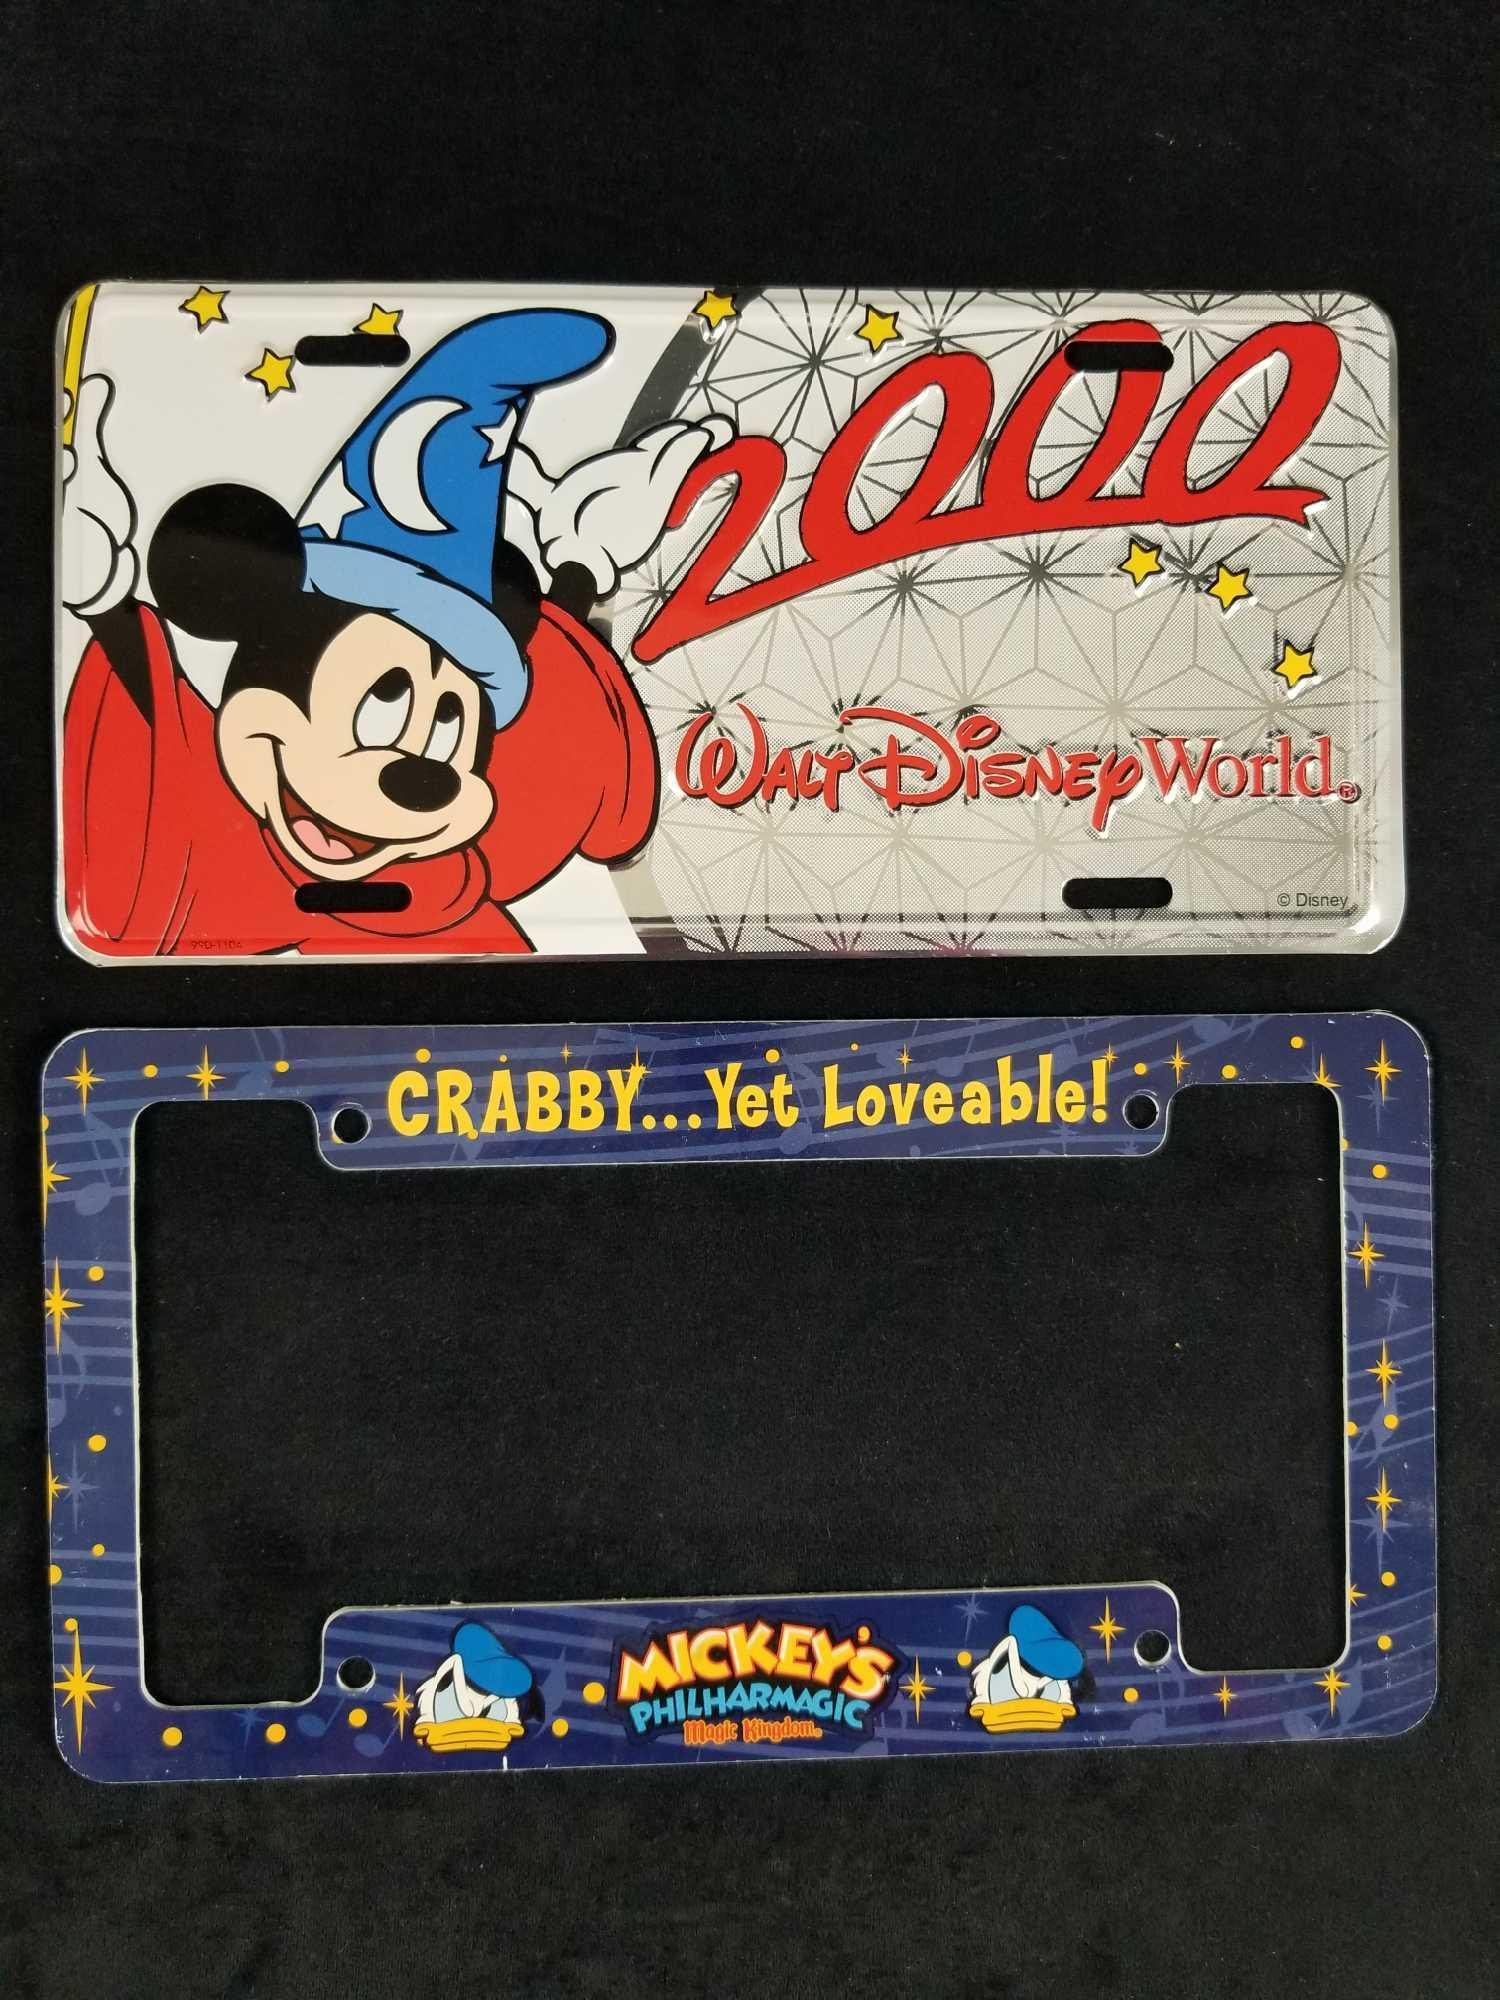 Lot of 2 Walt Disney World License